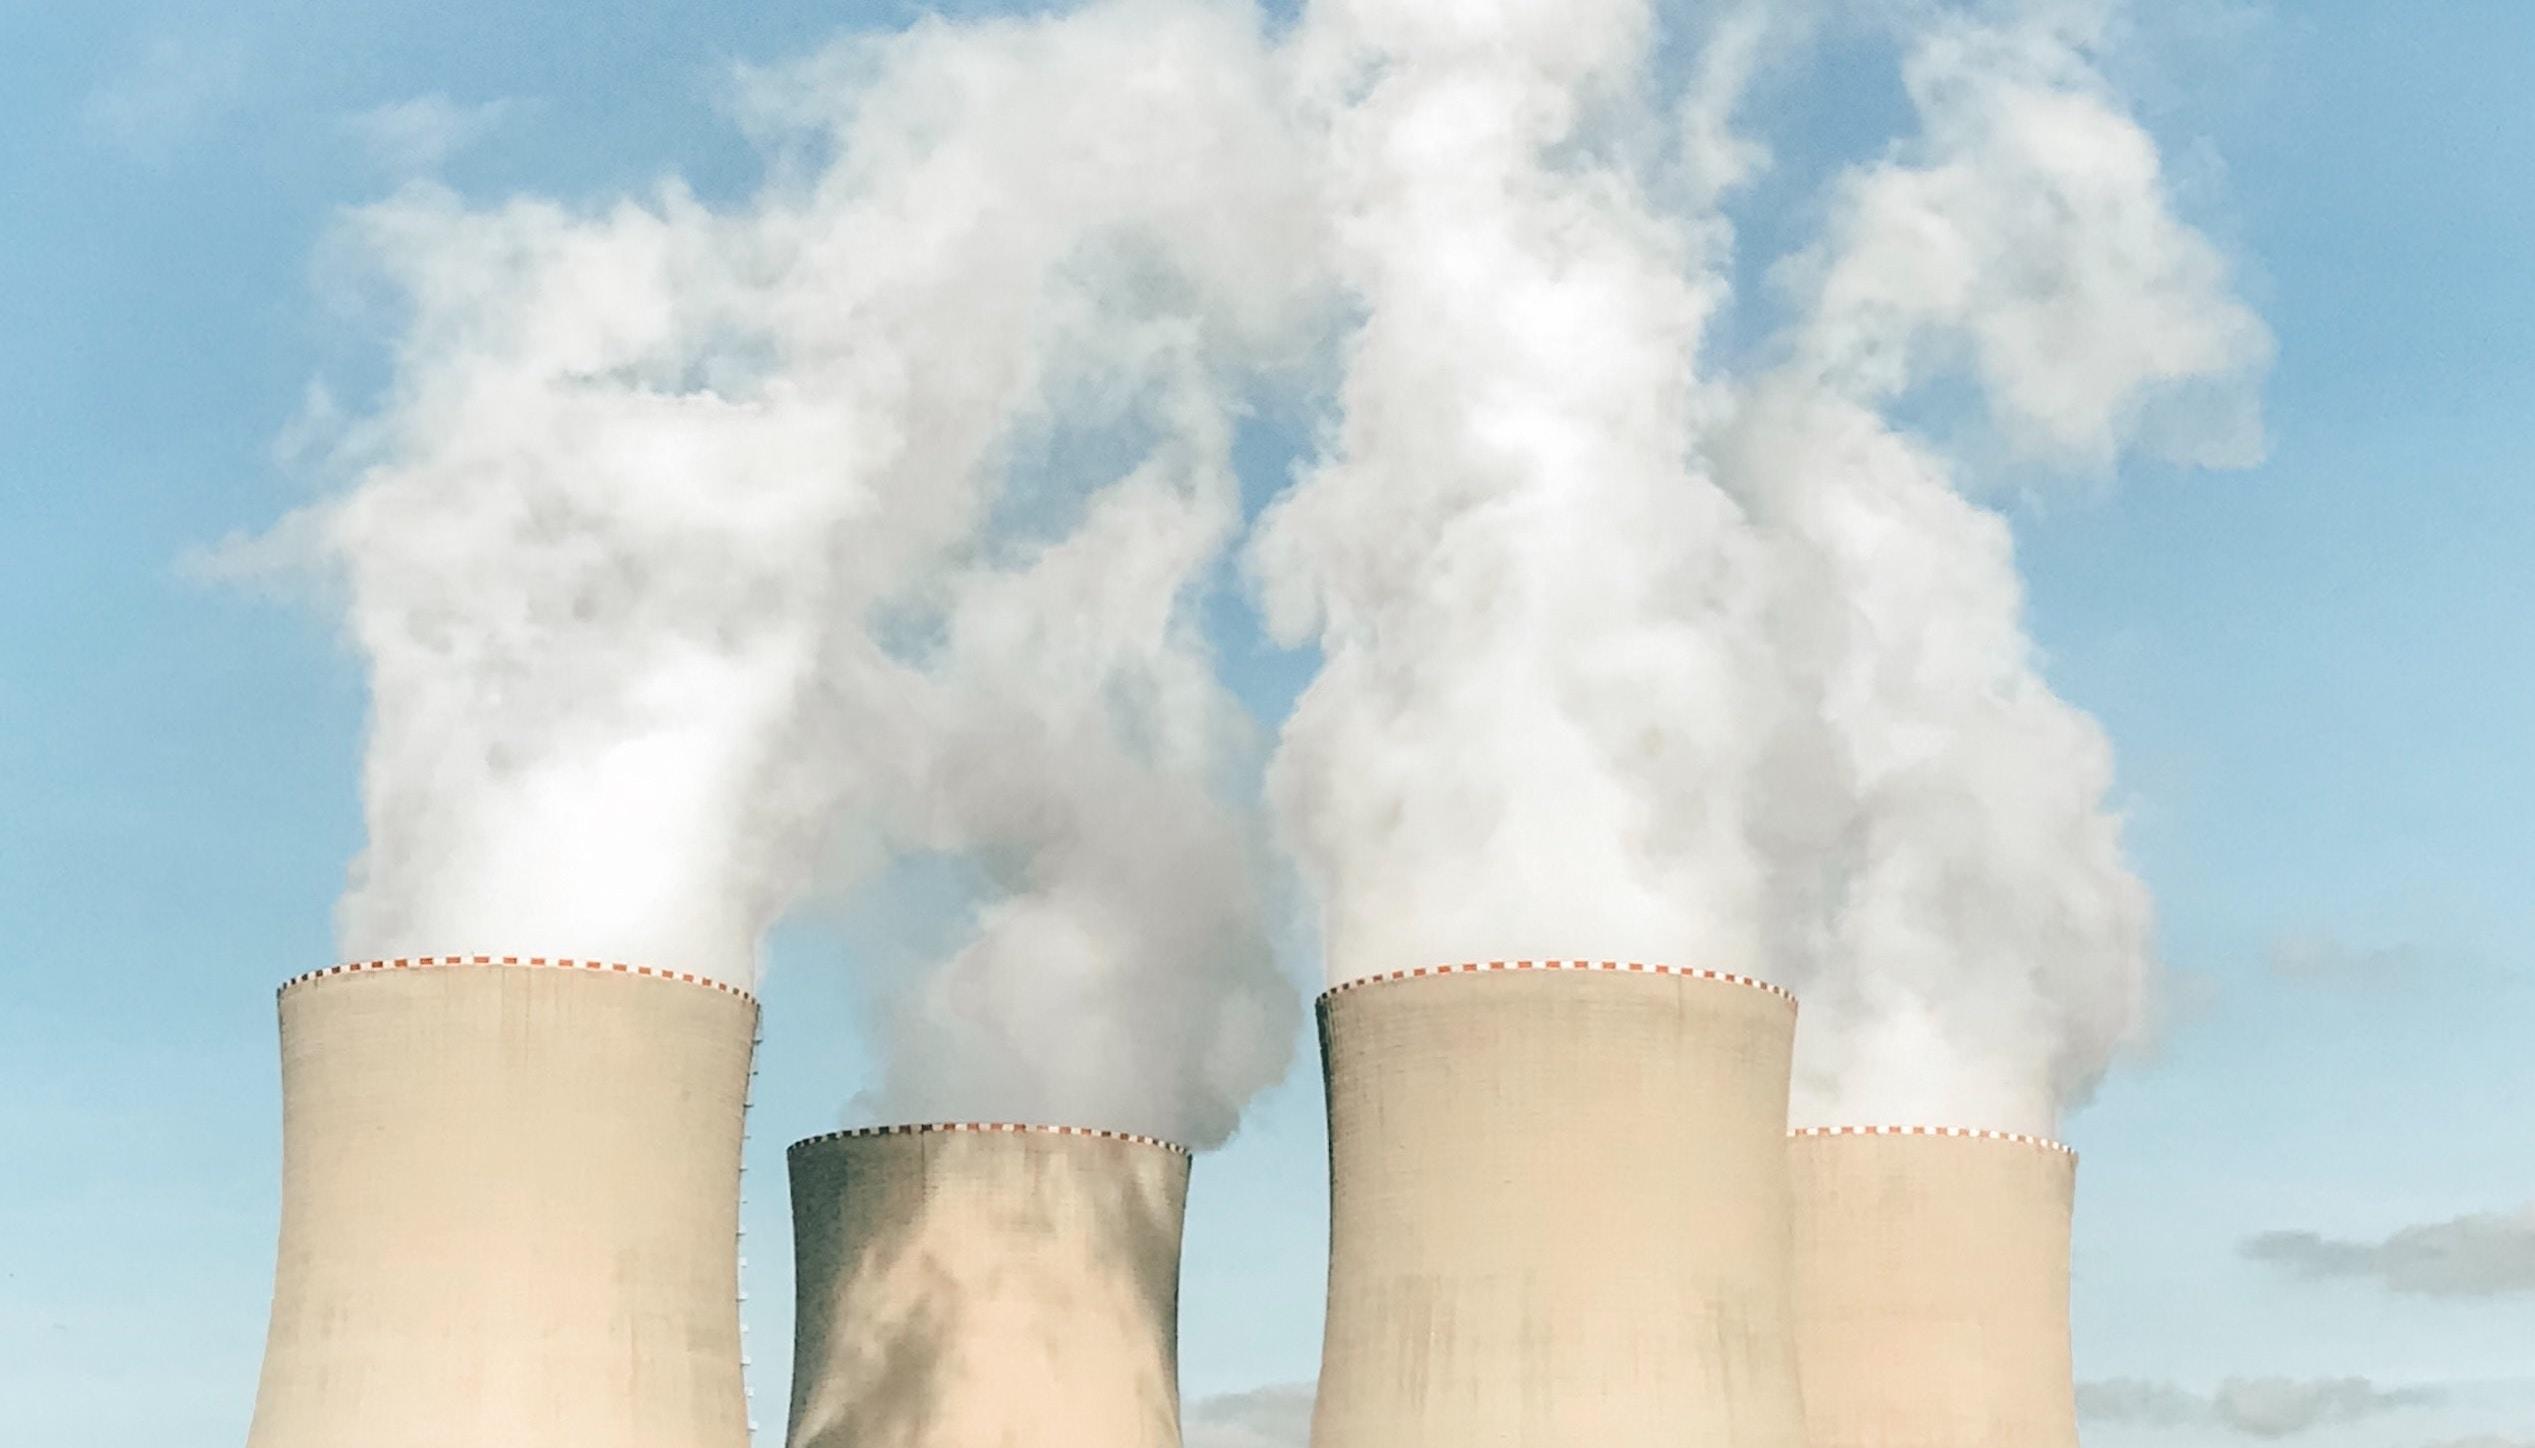 Nuclear plants releasing steam